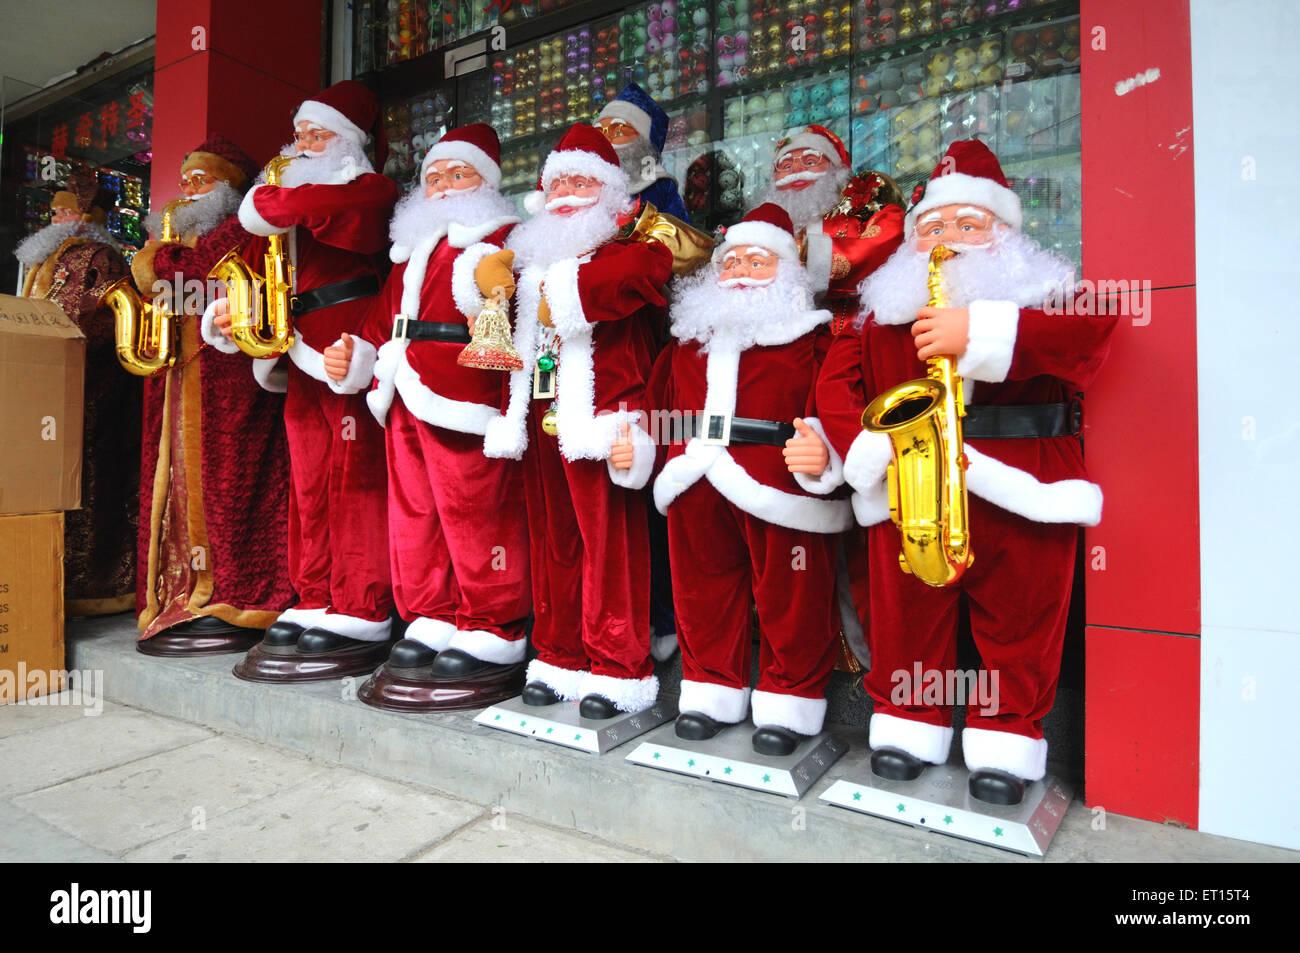 Santa Claus display Christmas shop window Beijing China - Stock Image